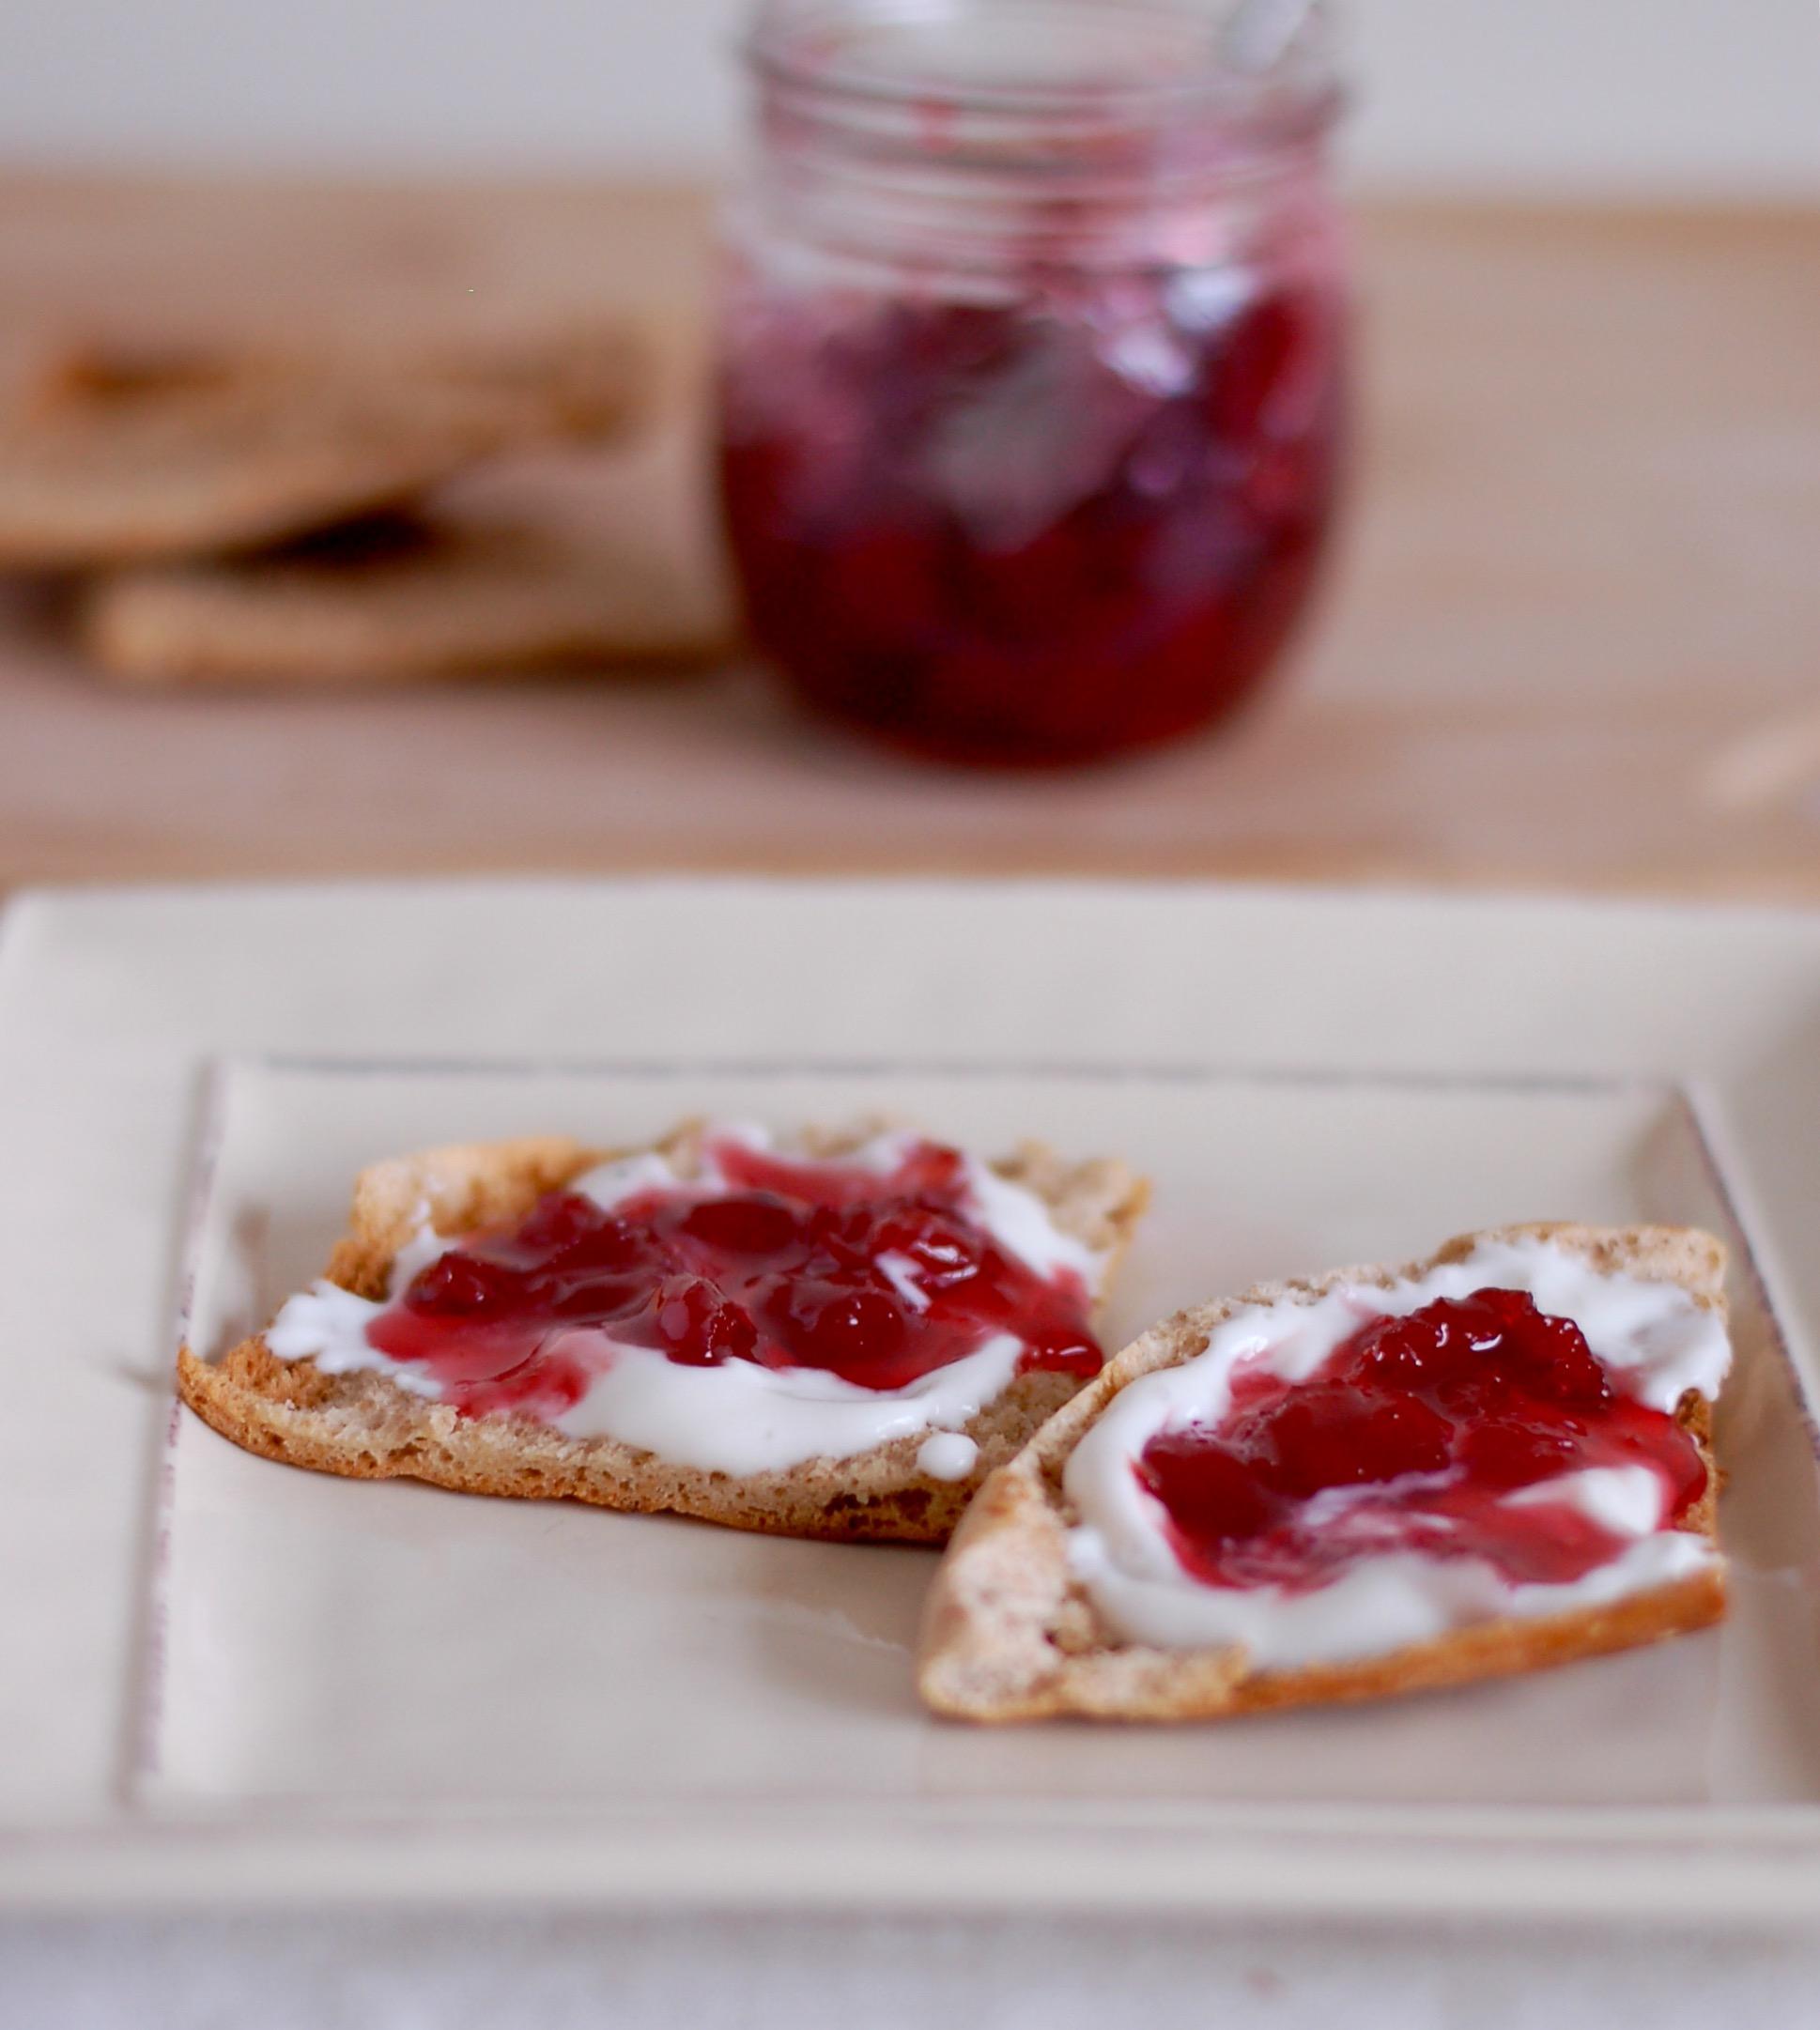 Tart Cherry Jam for my aunt Bonnie